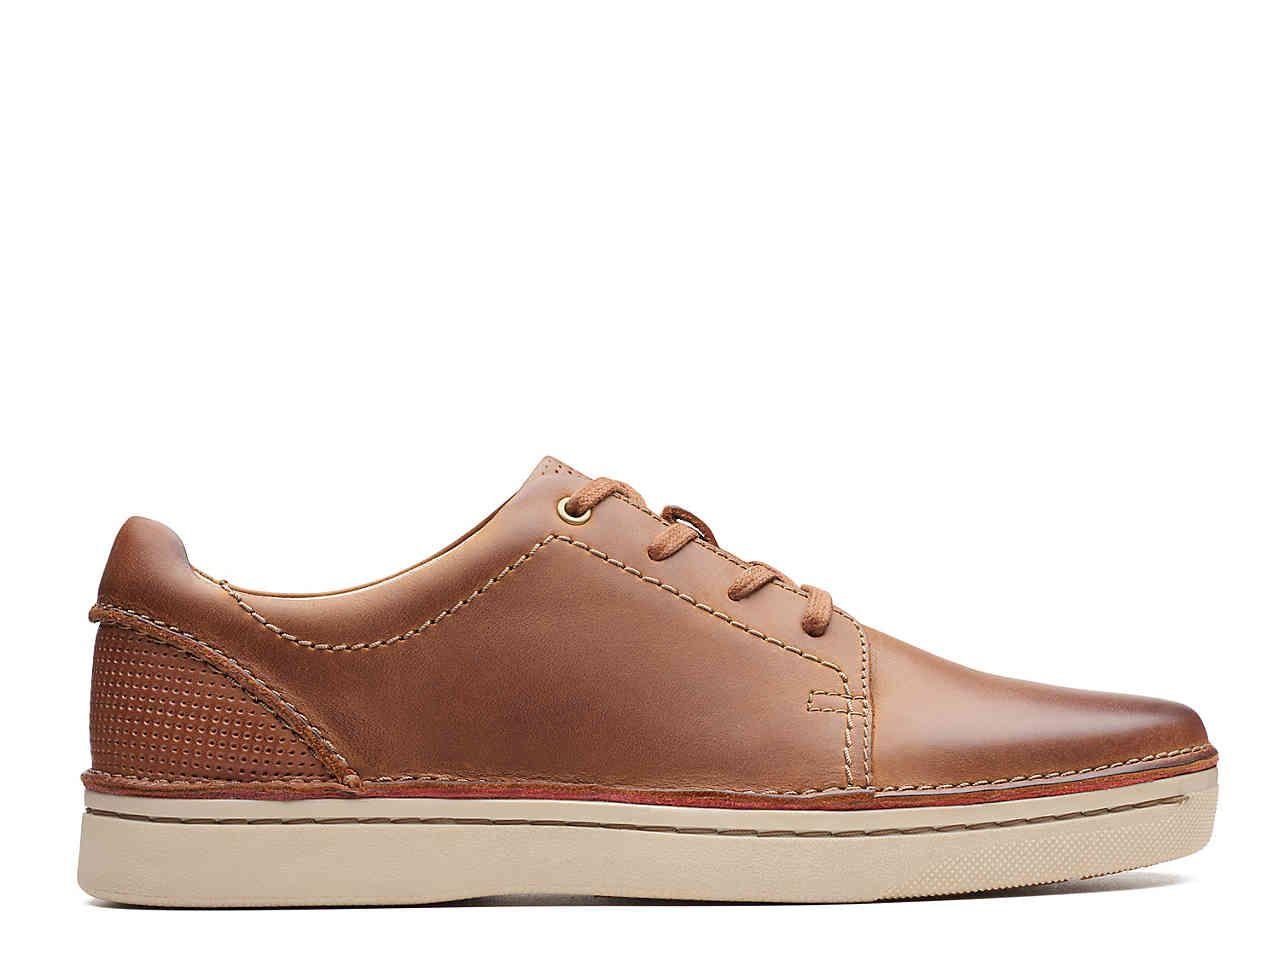 7033e630de8 Clarks Kitna Stride Sneaker Men s Shoes